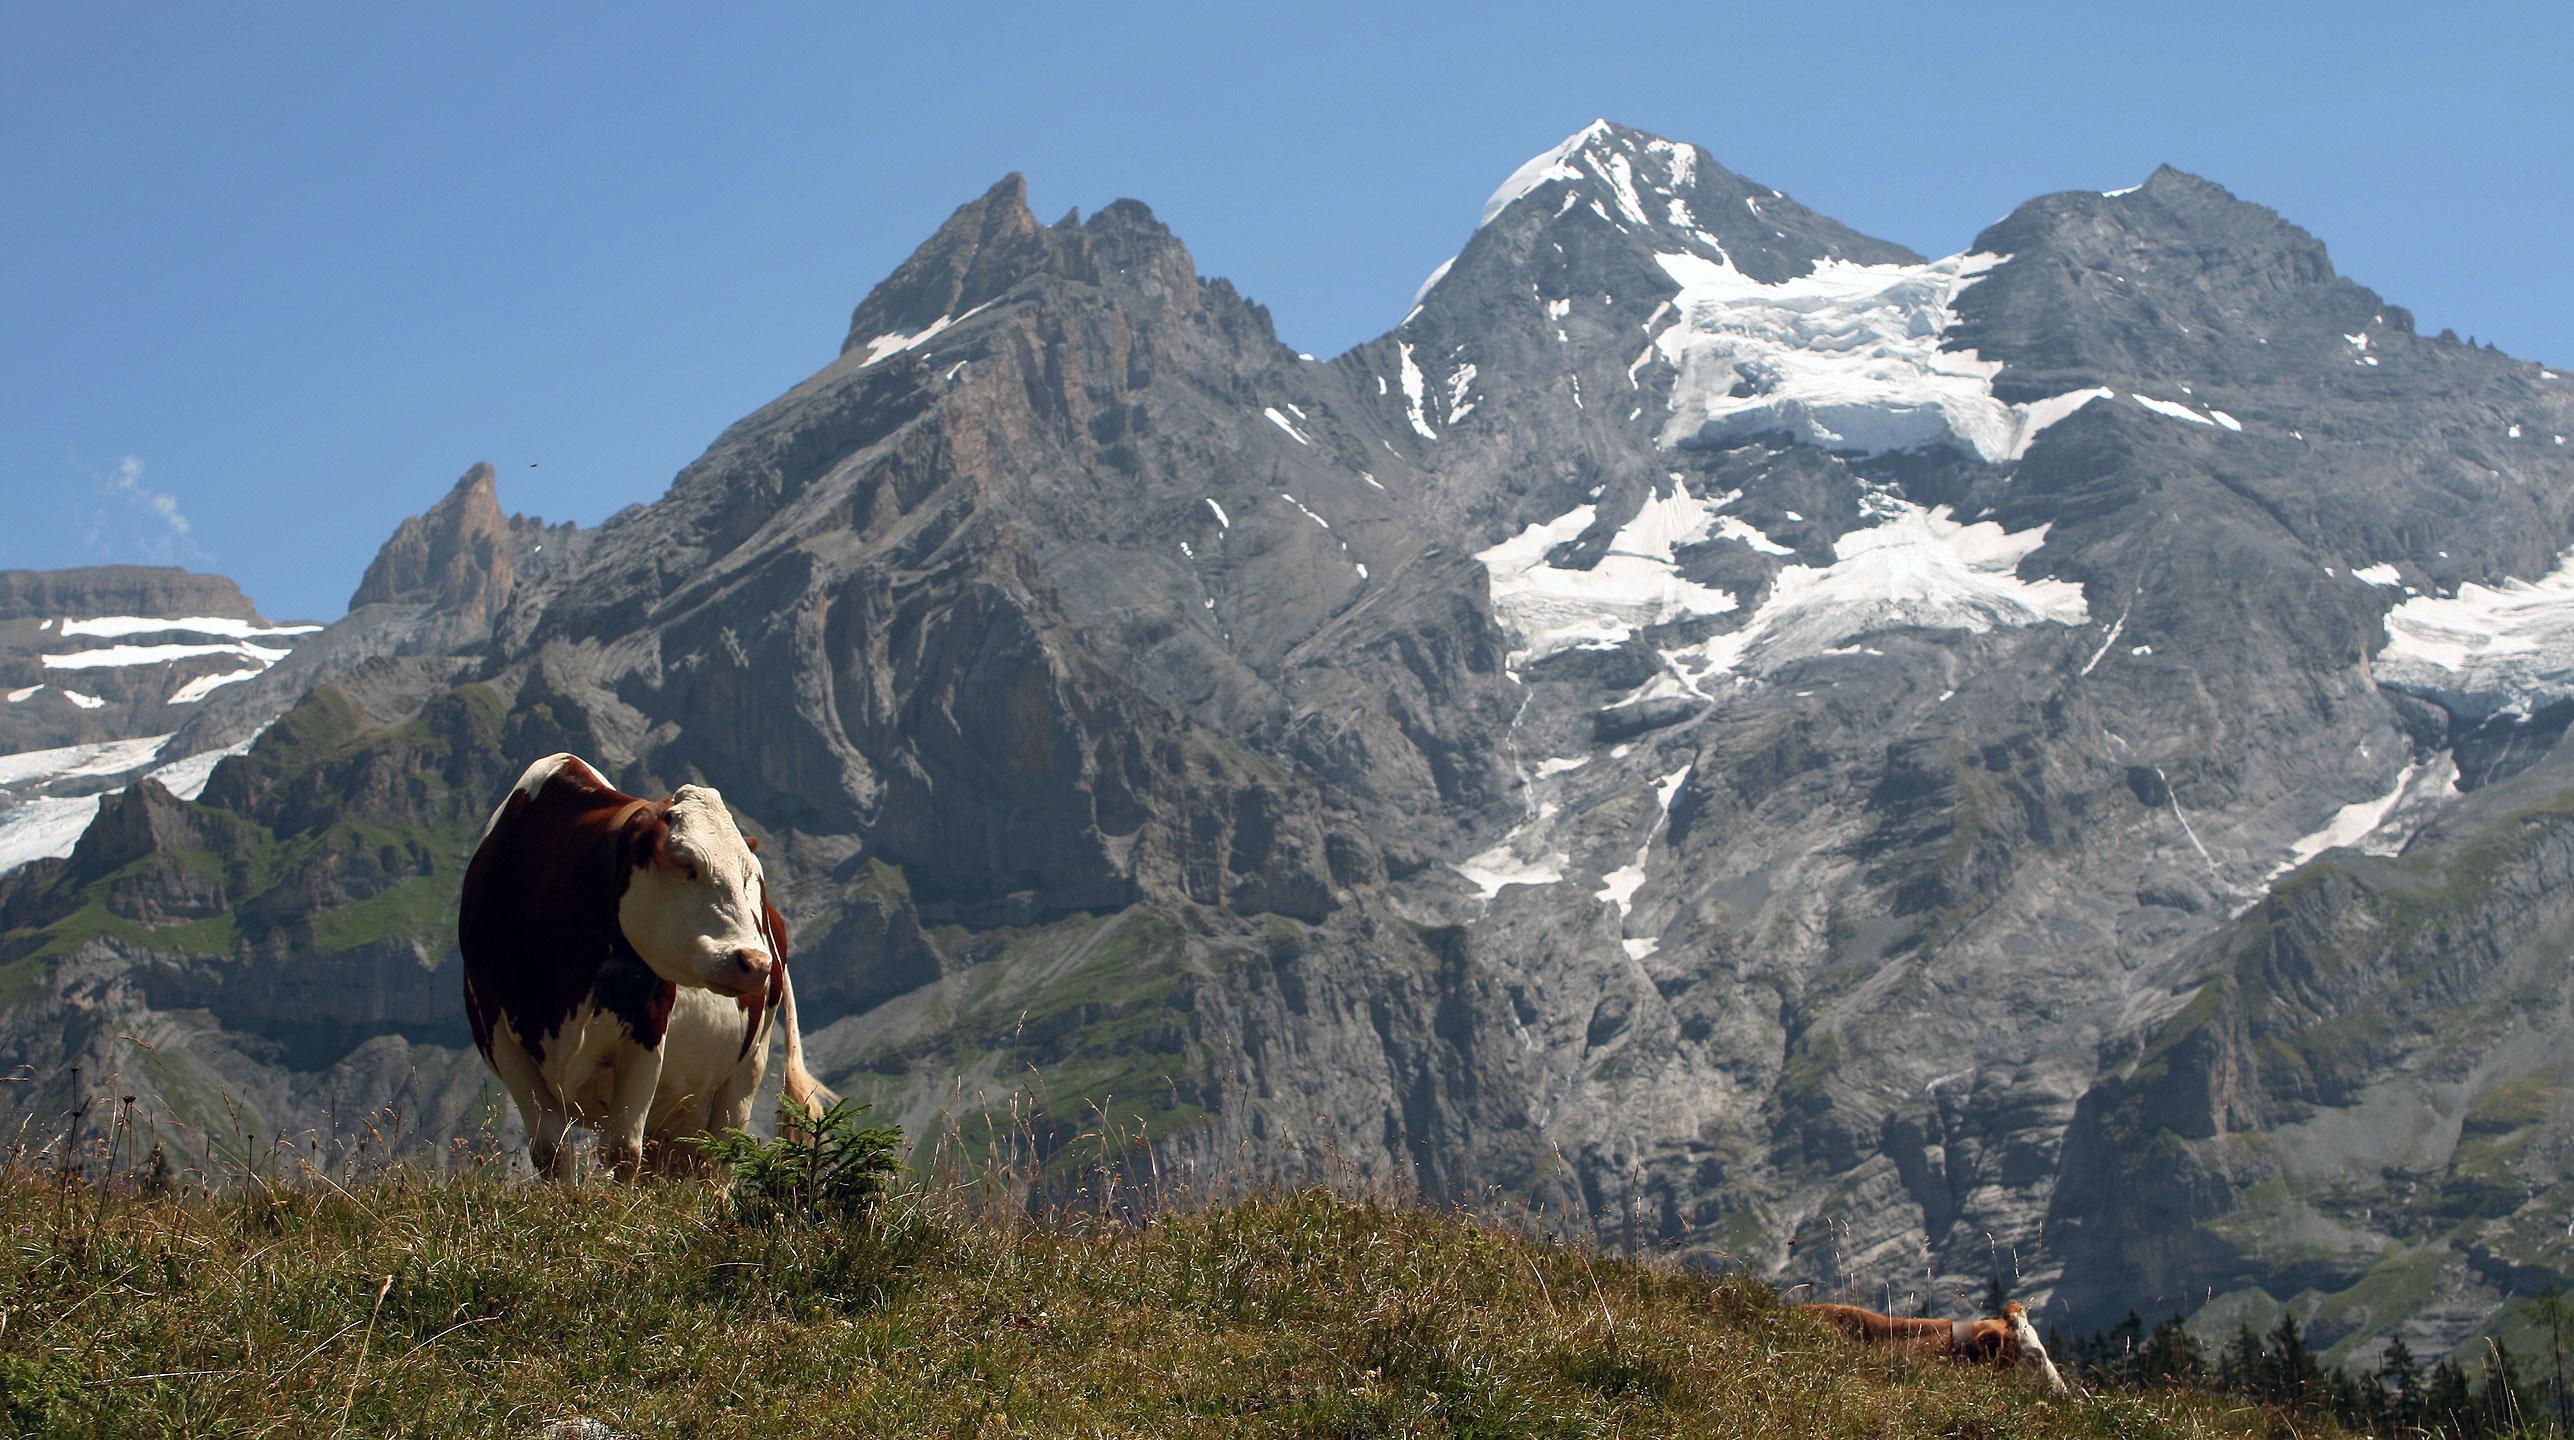 Szwajcaria – Berneński Oberland, Blüemlisalp i Bire